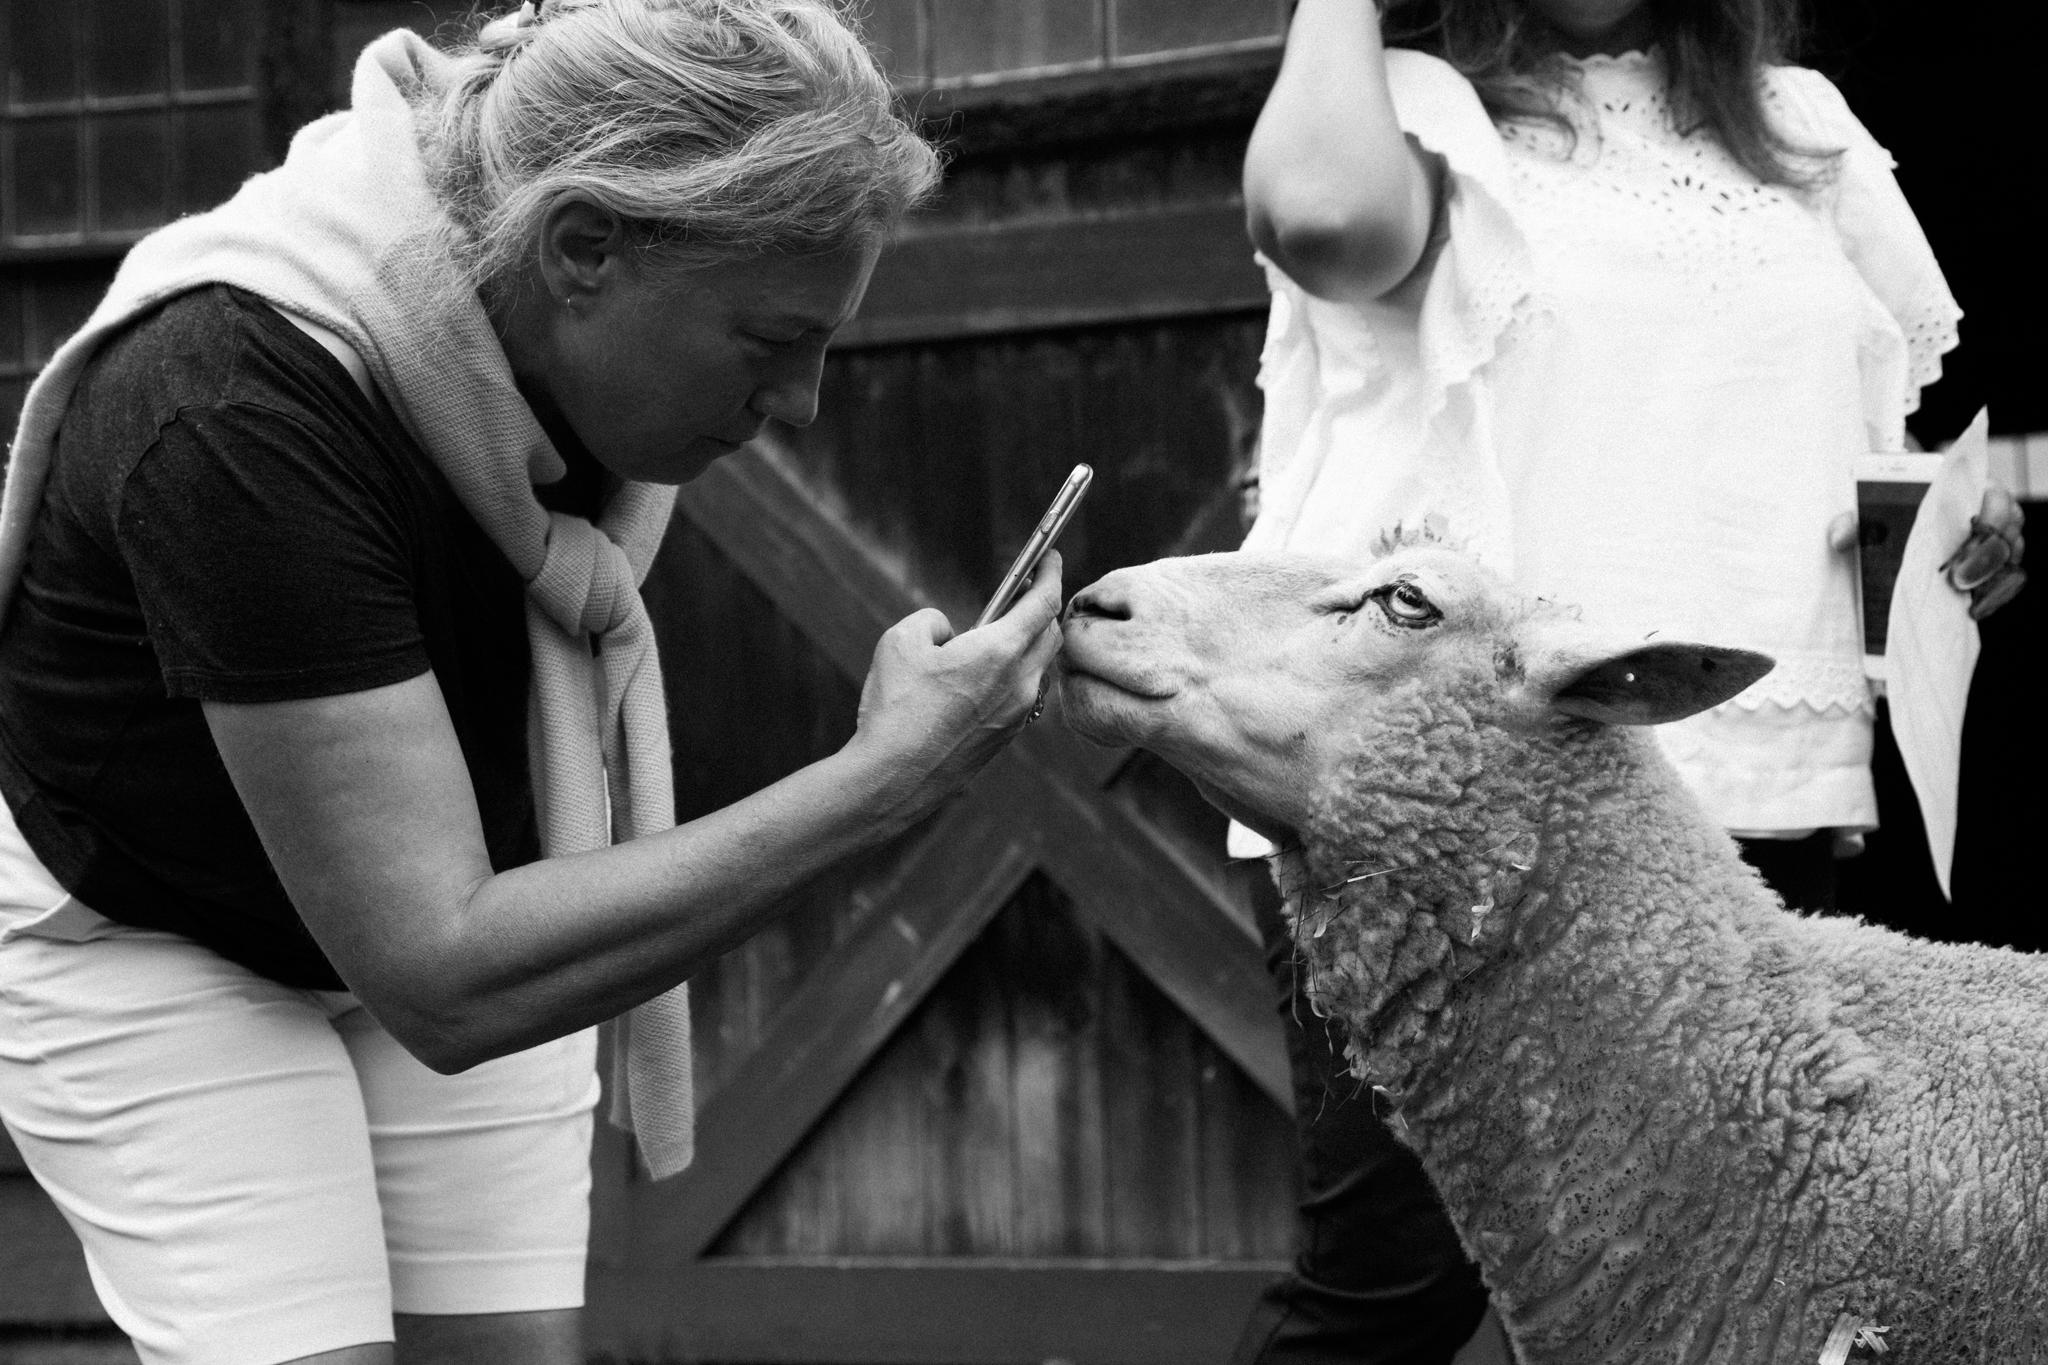 Holz-Weston-Nude-Workshop-2017-22-by-Annabelle-Scott.jpg